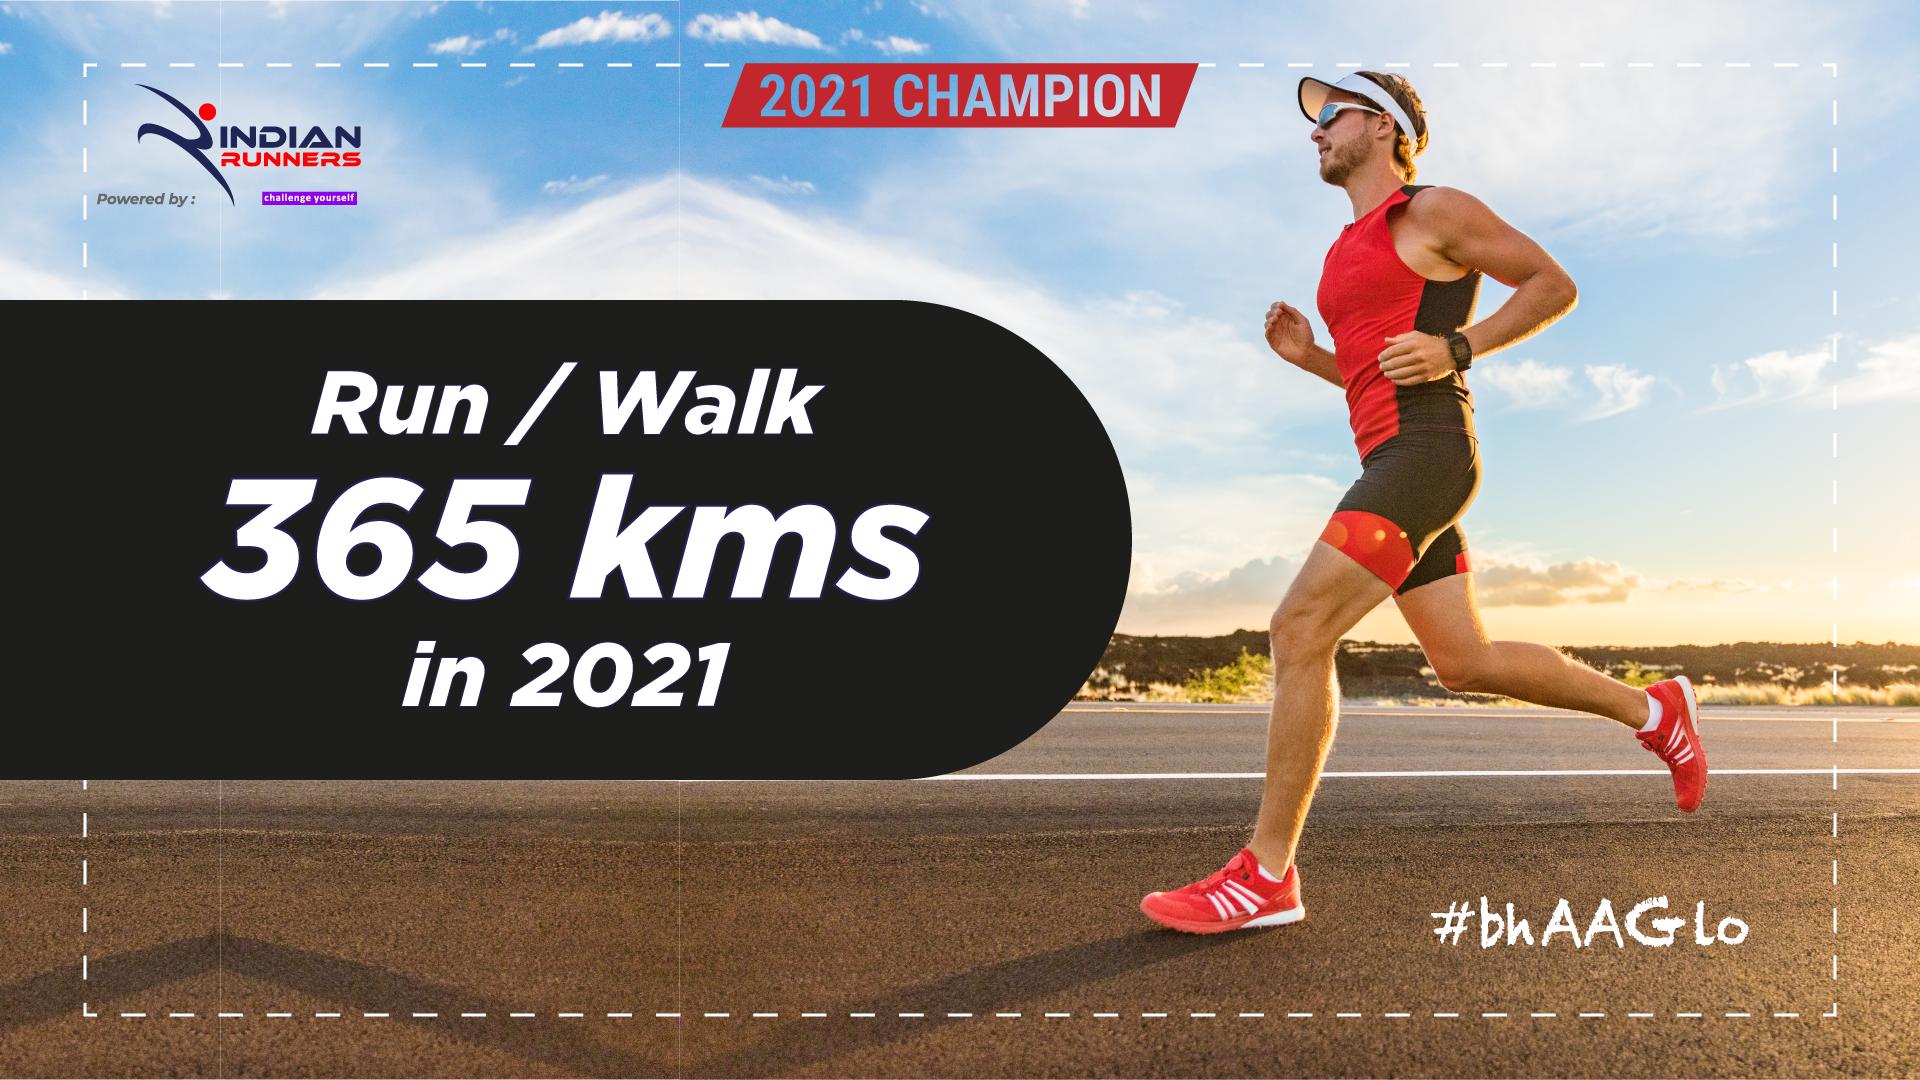 Run 365 Kms in 2021 image